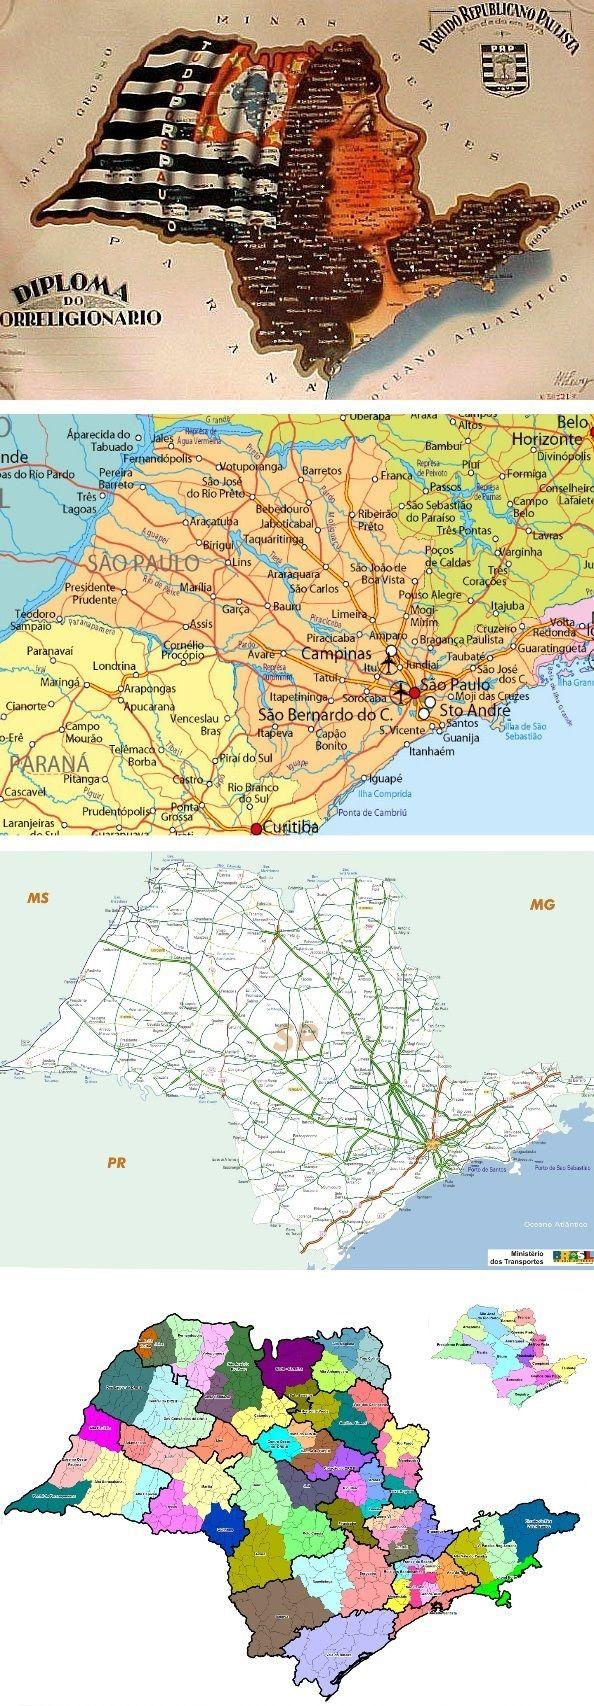 Saint paul state map brazil mapa do estado de s o paulo brasil